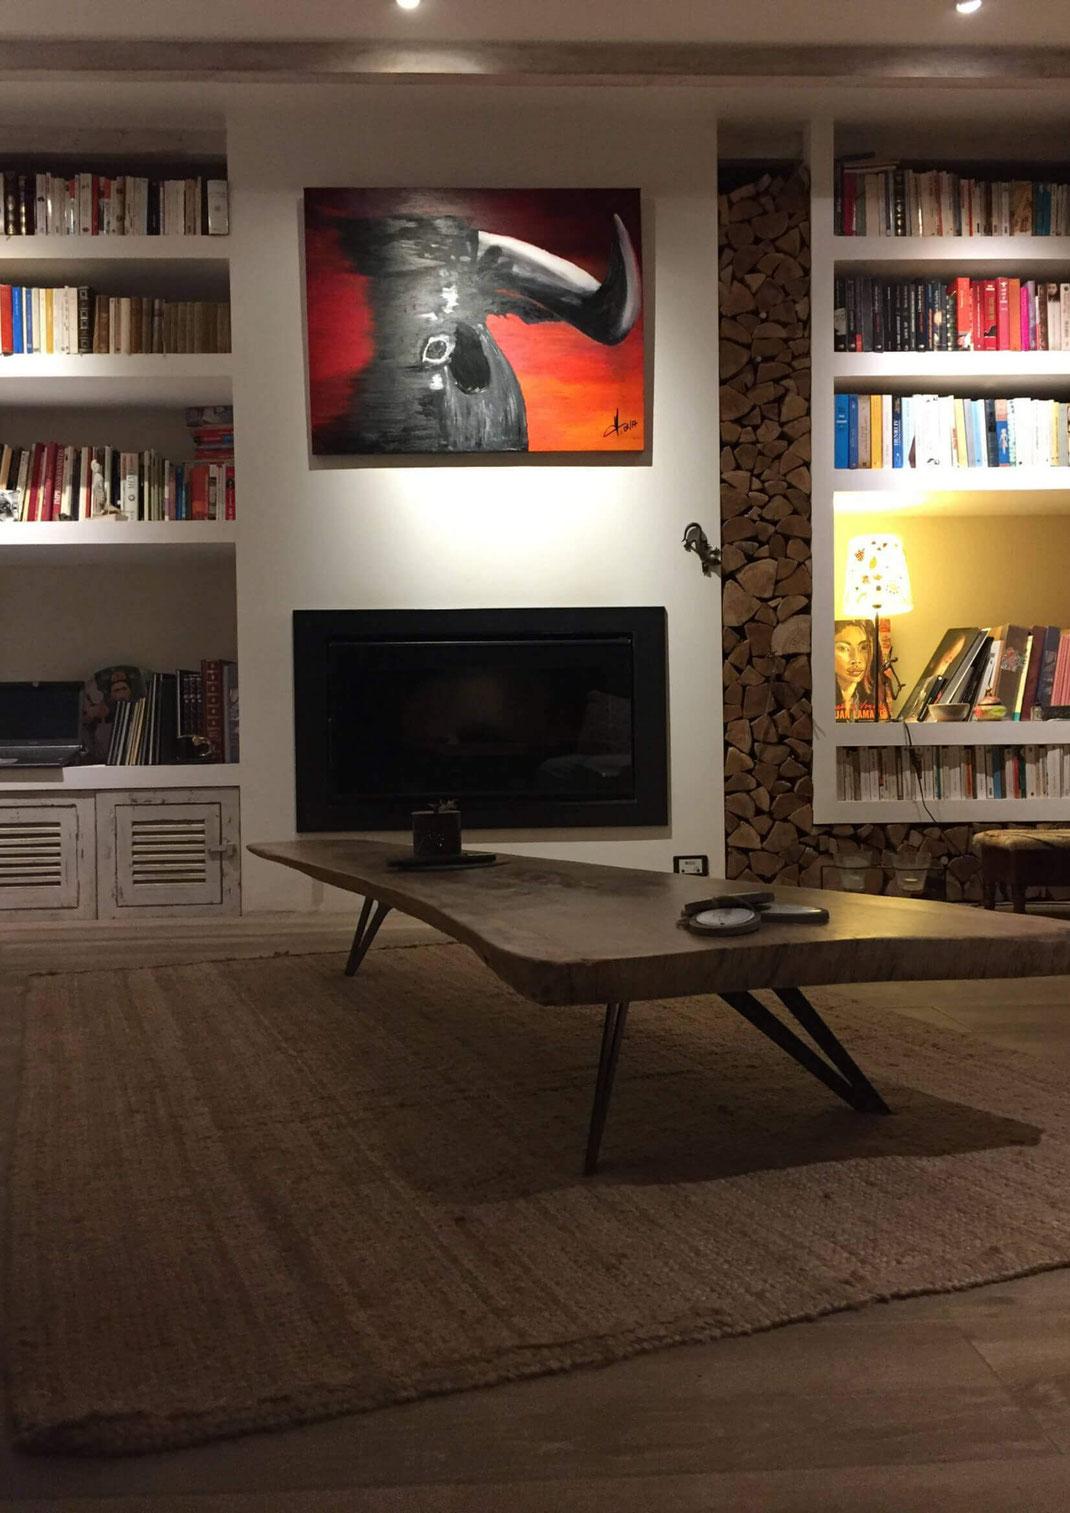 Pied de table design pour salon made in piedtable.fr